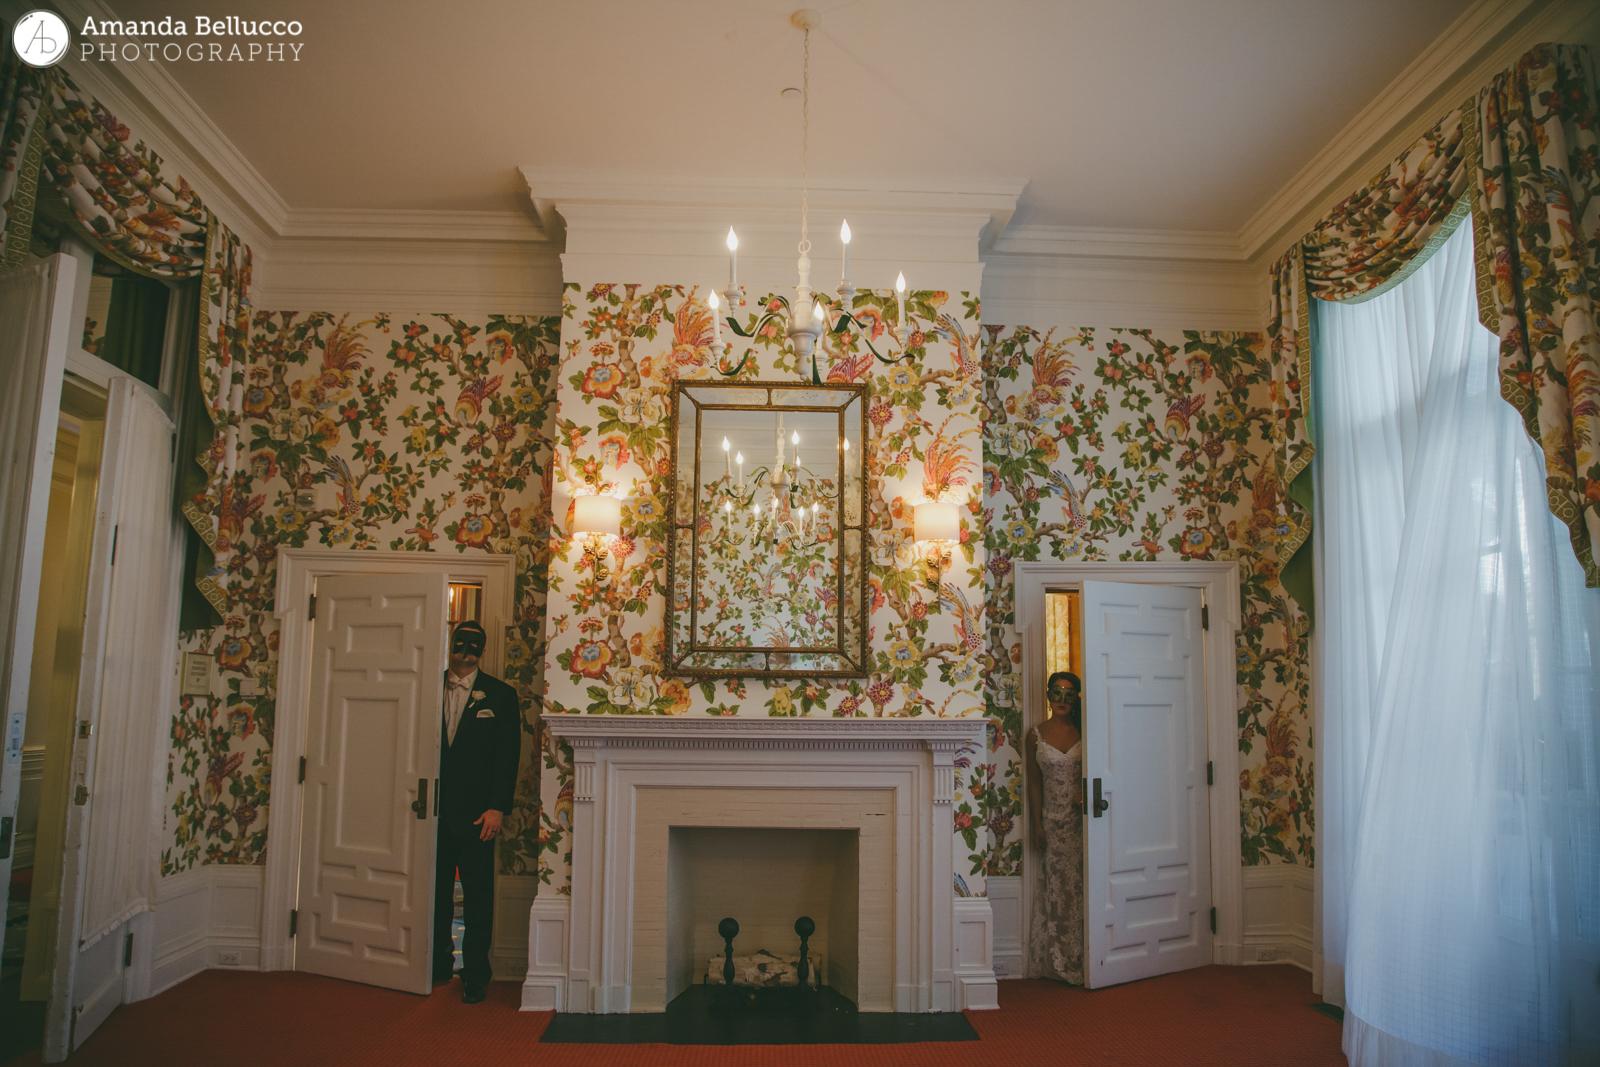 syracuse-rochester-fine-art-wedding-photographer-105.JPG